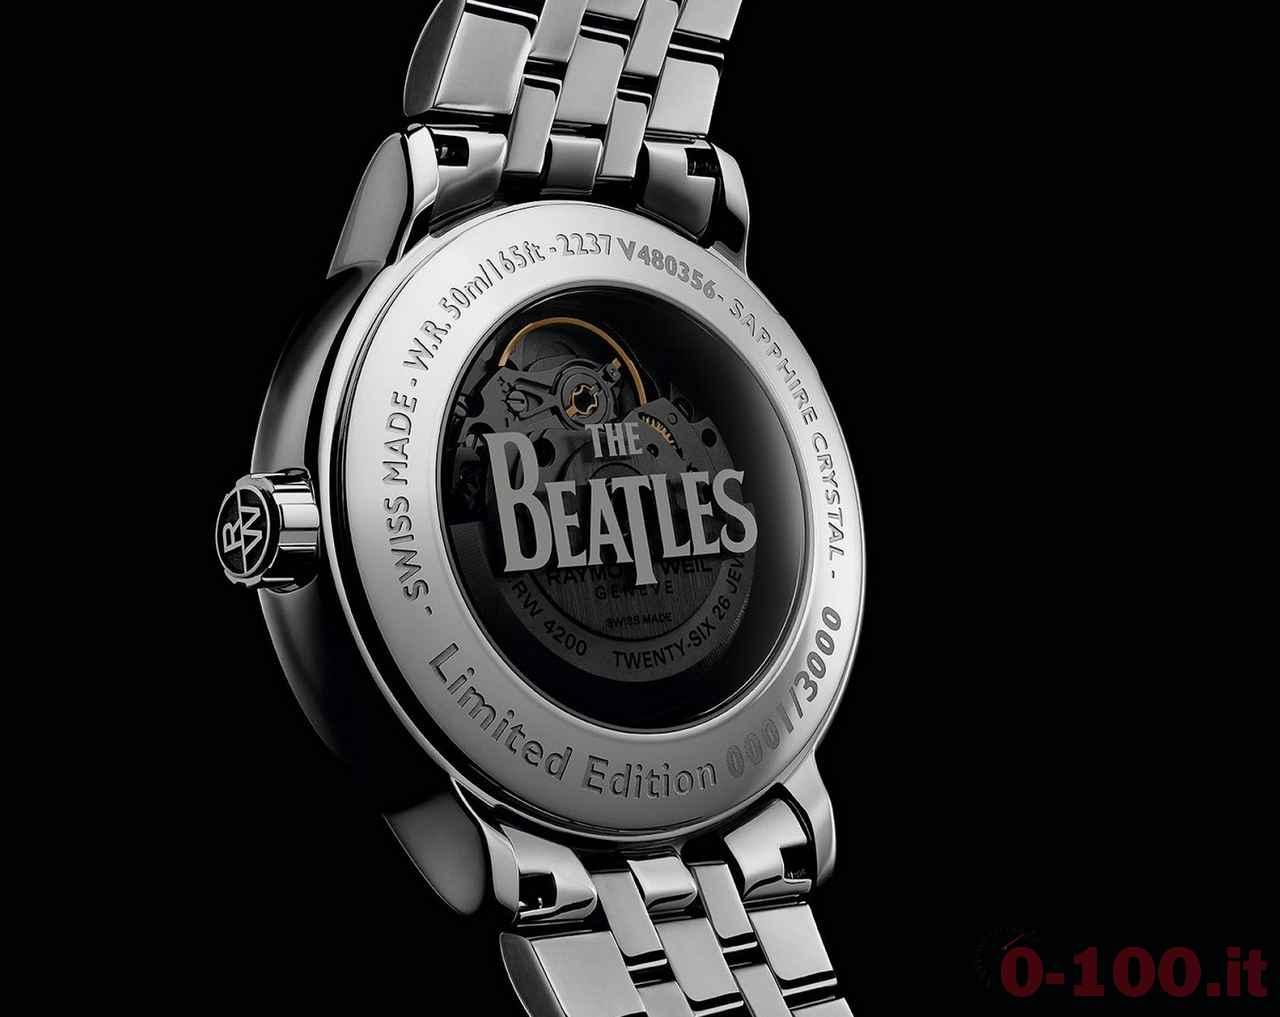 raymond-weil-maestro-beatles-limited-edition-ref-2237-st-beat1-prezzo-price_0-1002